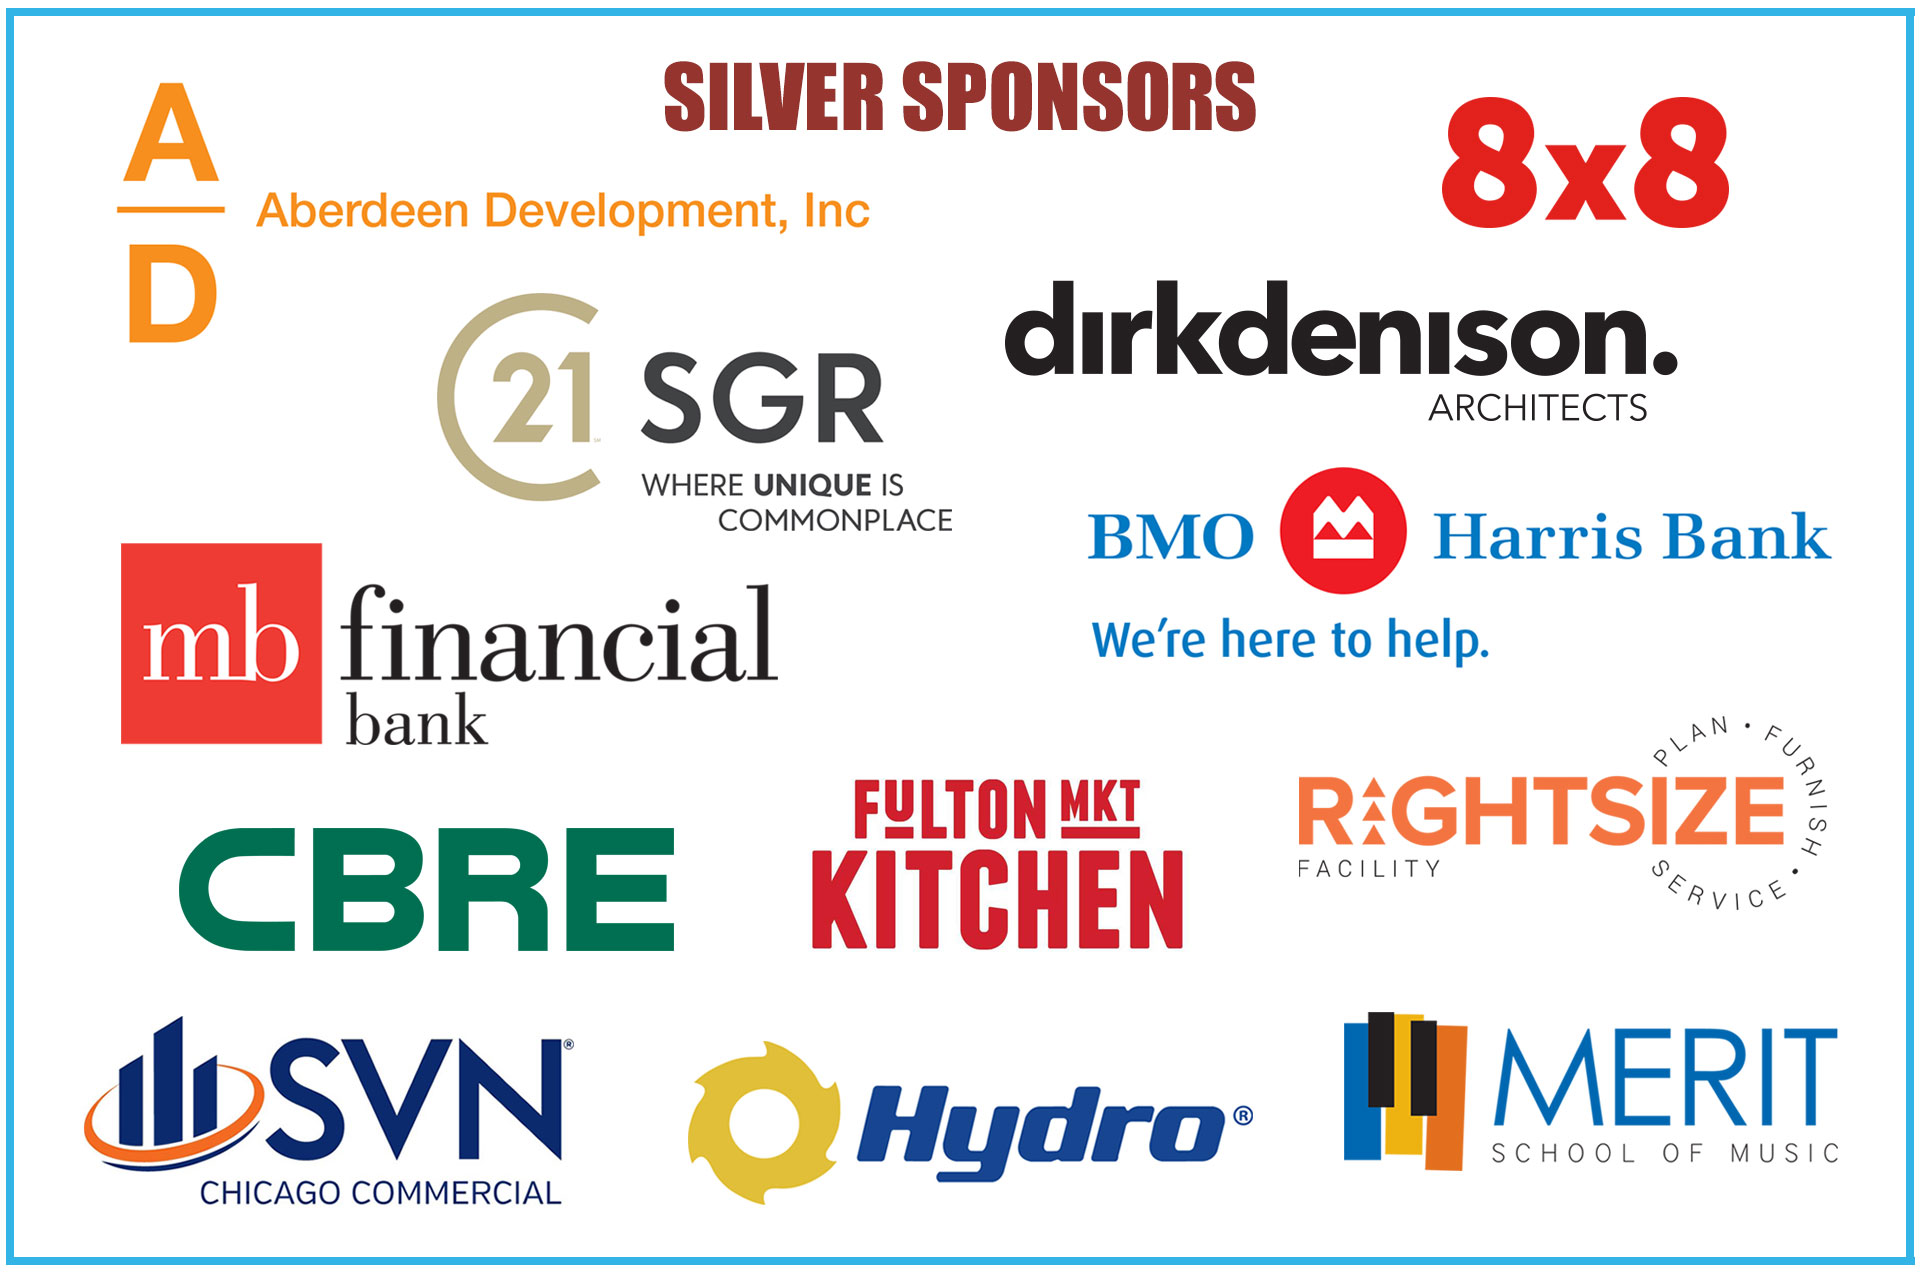 sponsors-silver.jpg